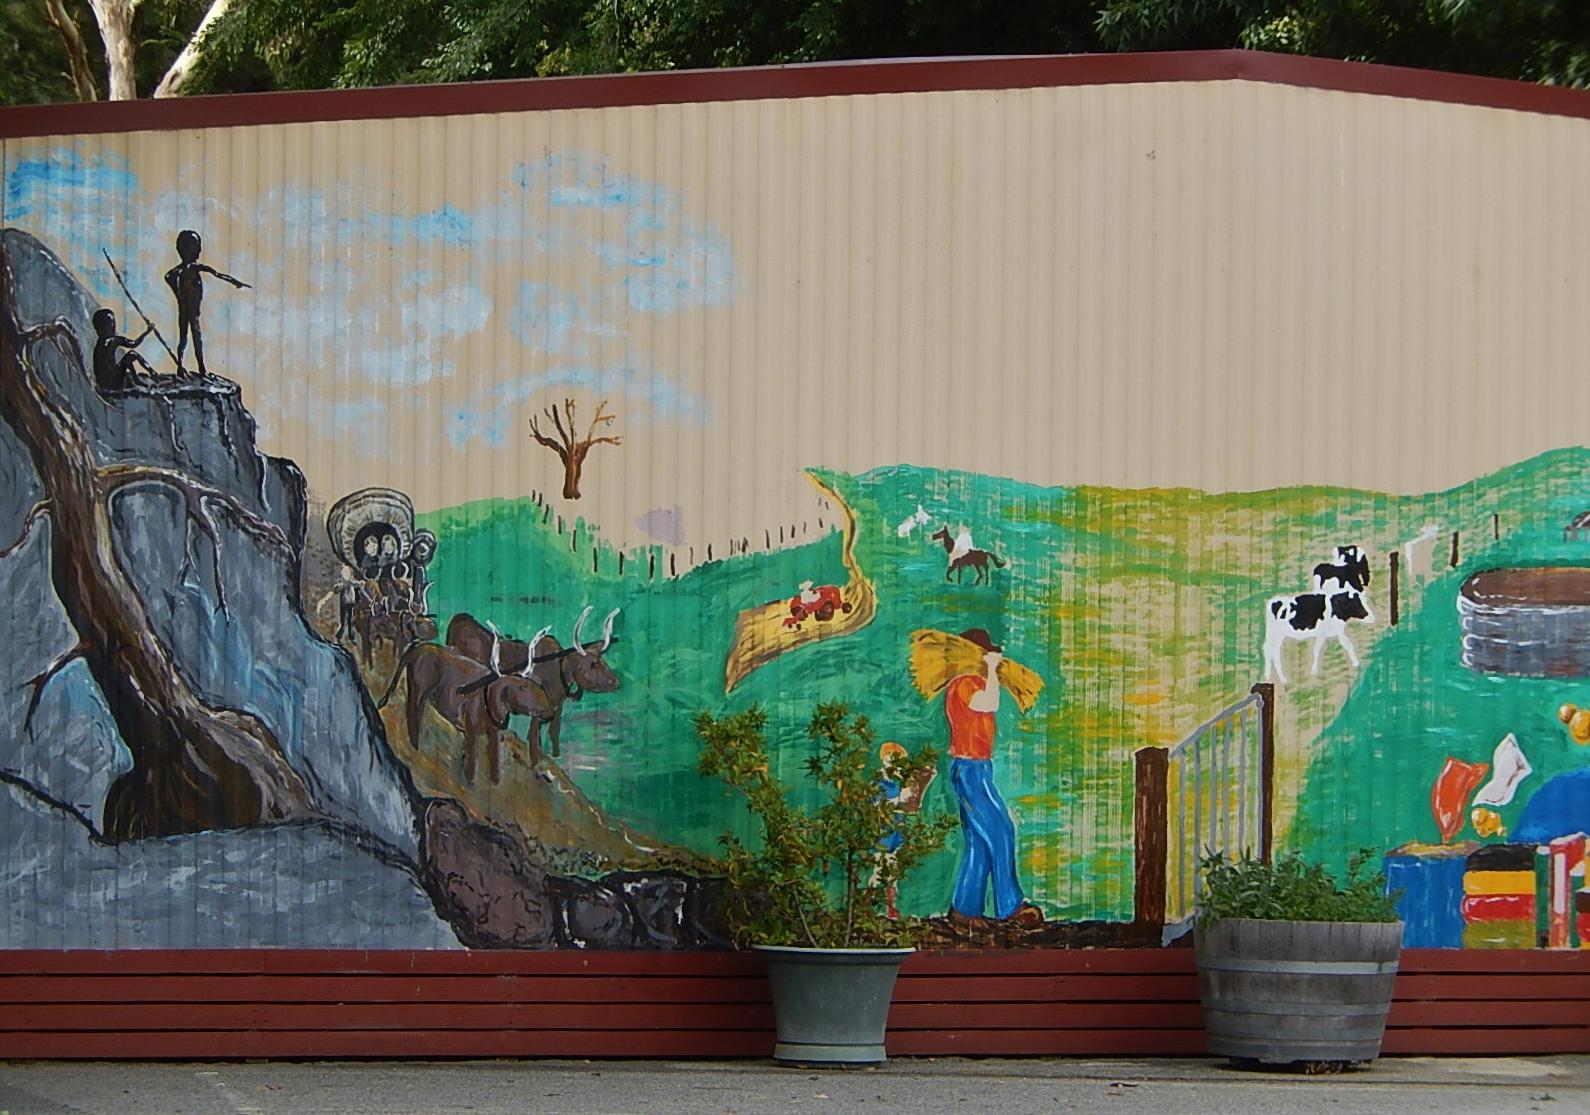 Brief history of australia in school mural flickr for Australian mural